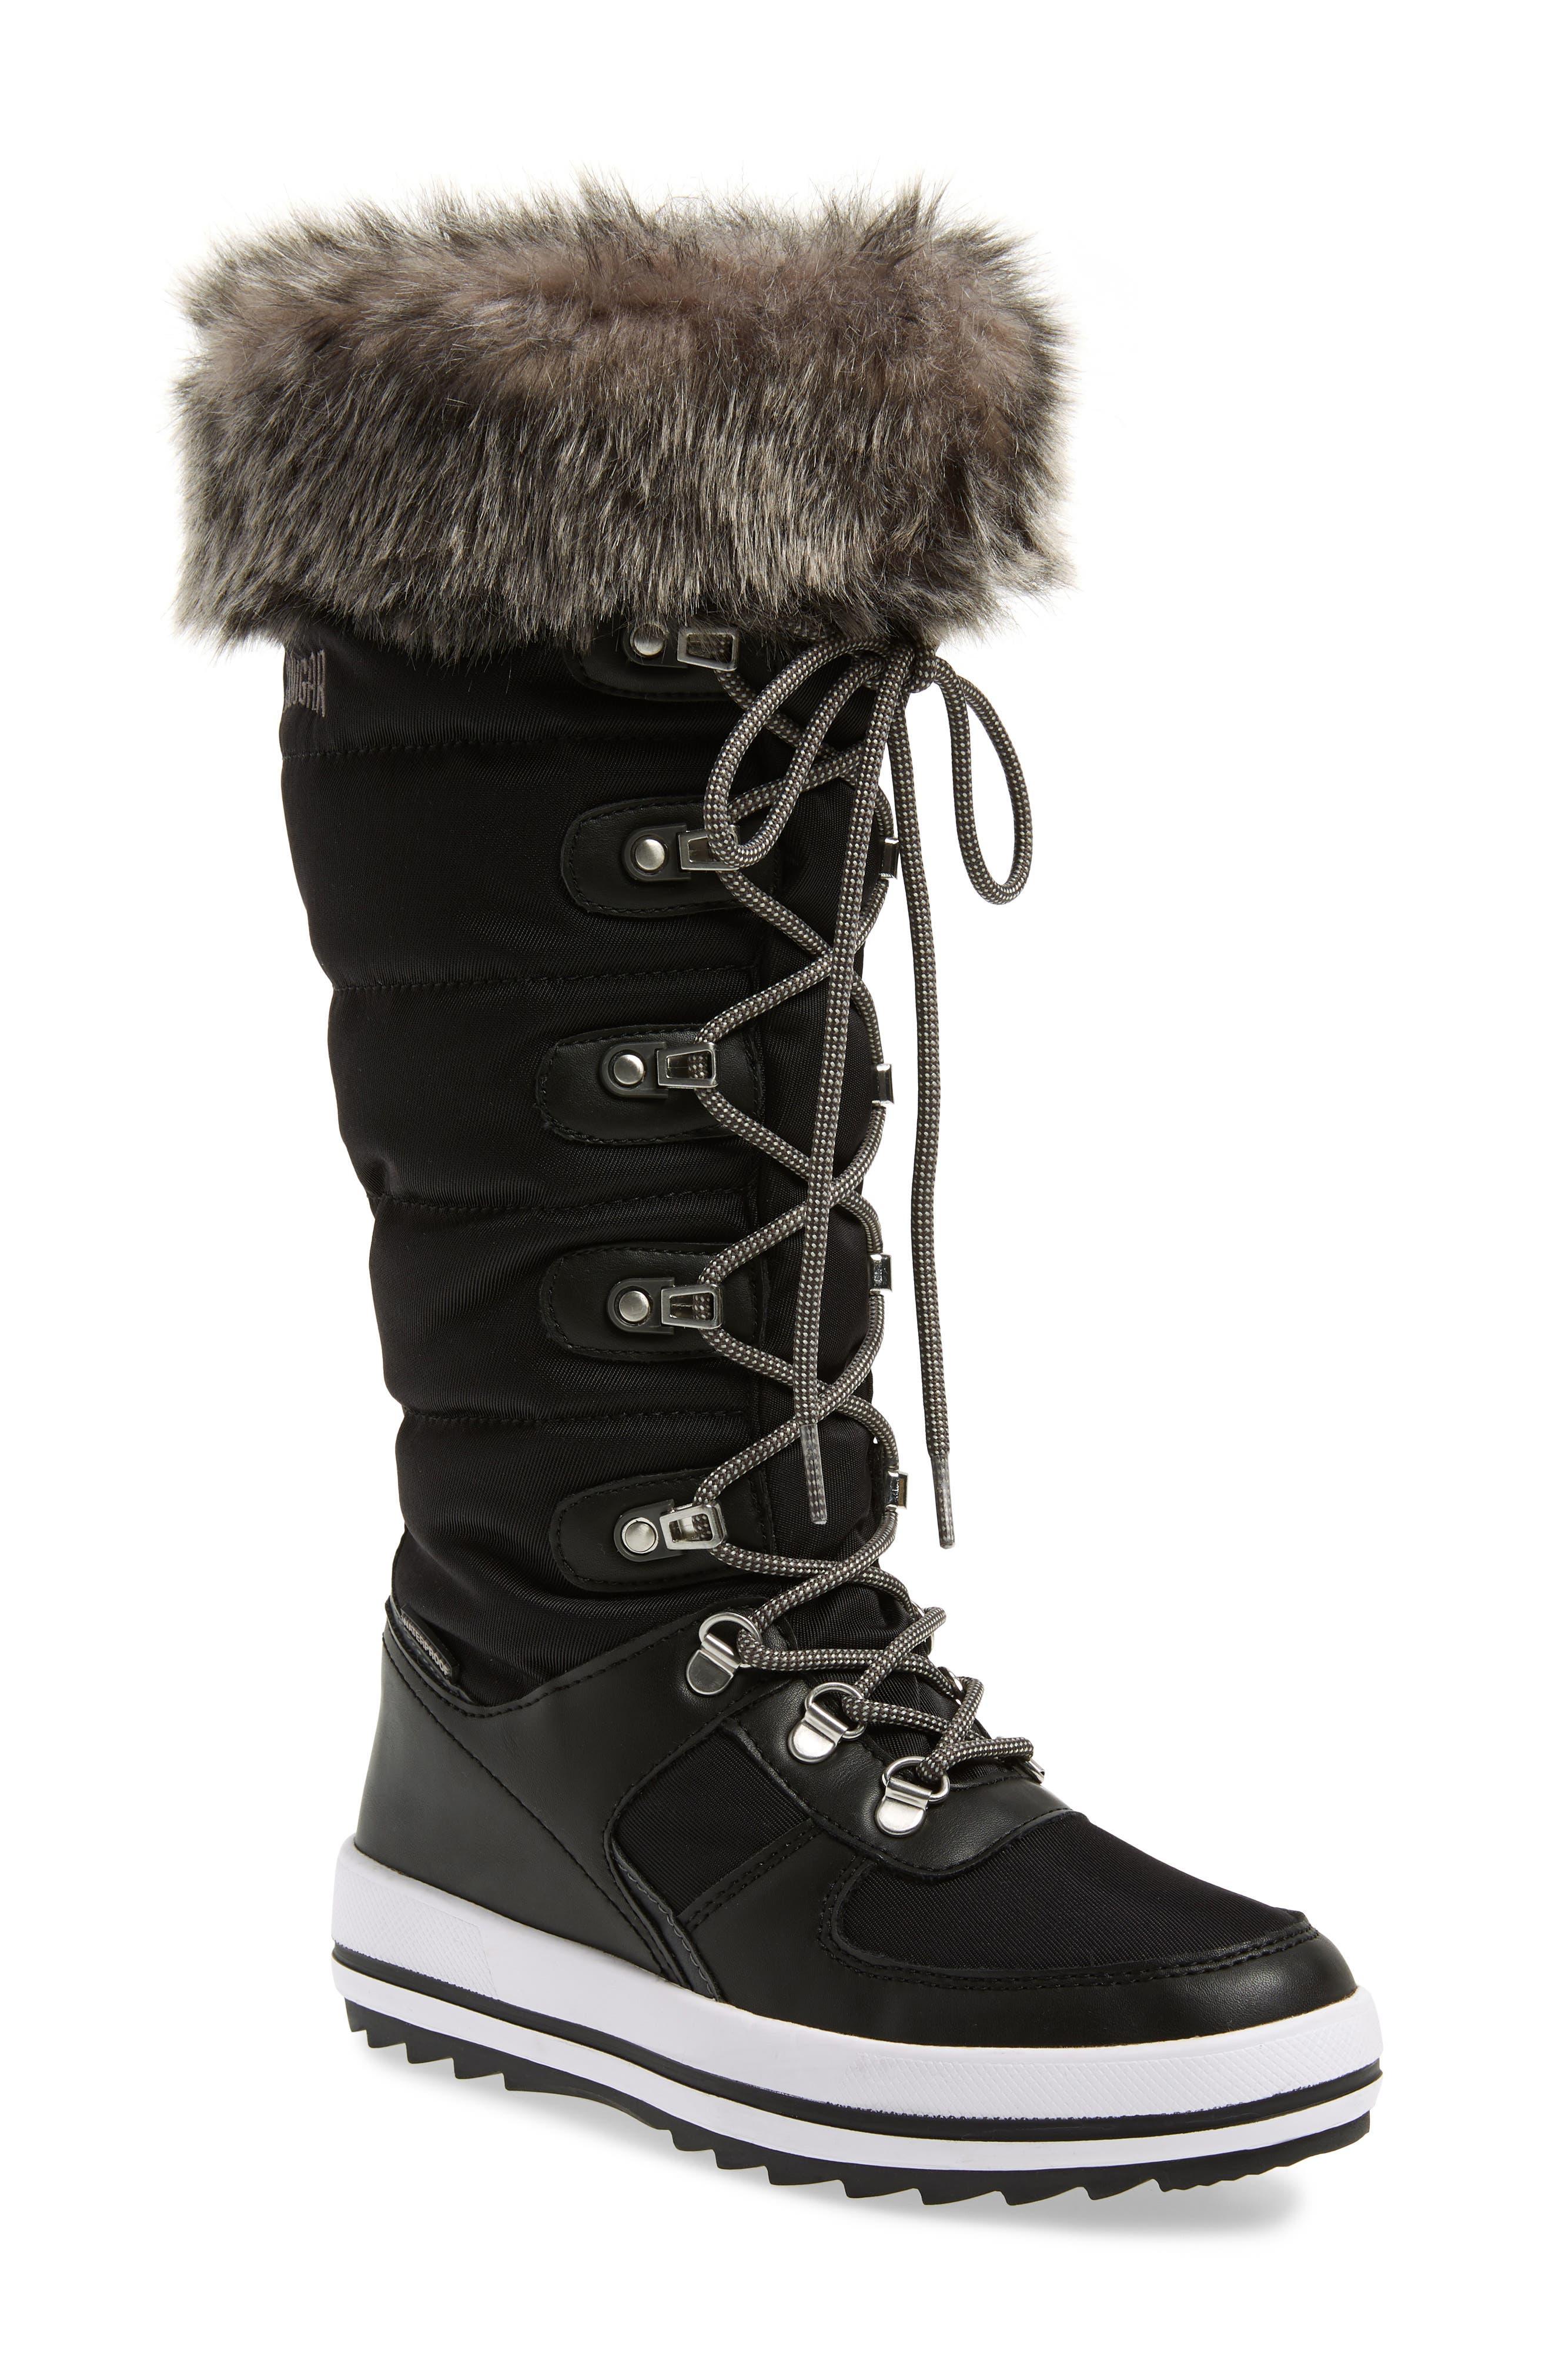 COUGAR, Vesta Faux Fur Collar Knee High Snow Boot, Main thumbnail 1, color, BLACK FABRIC